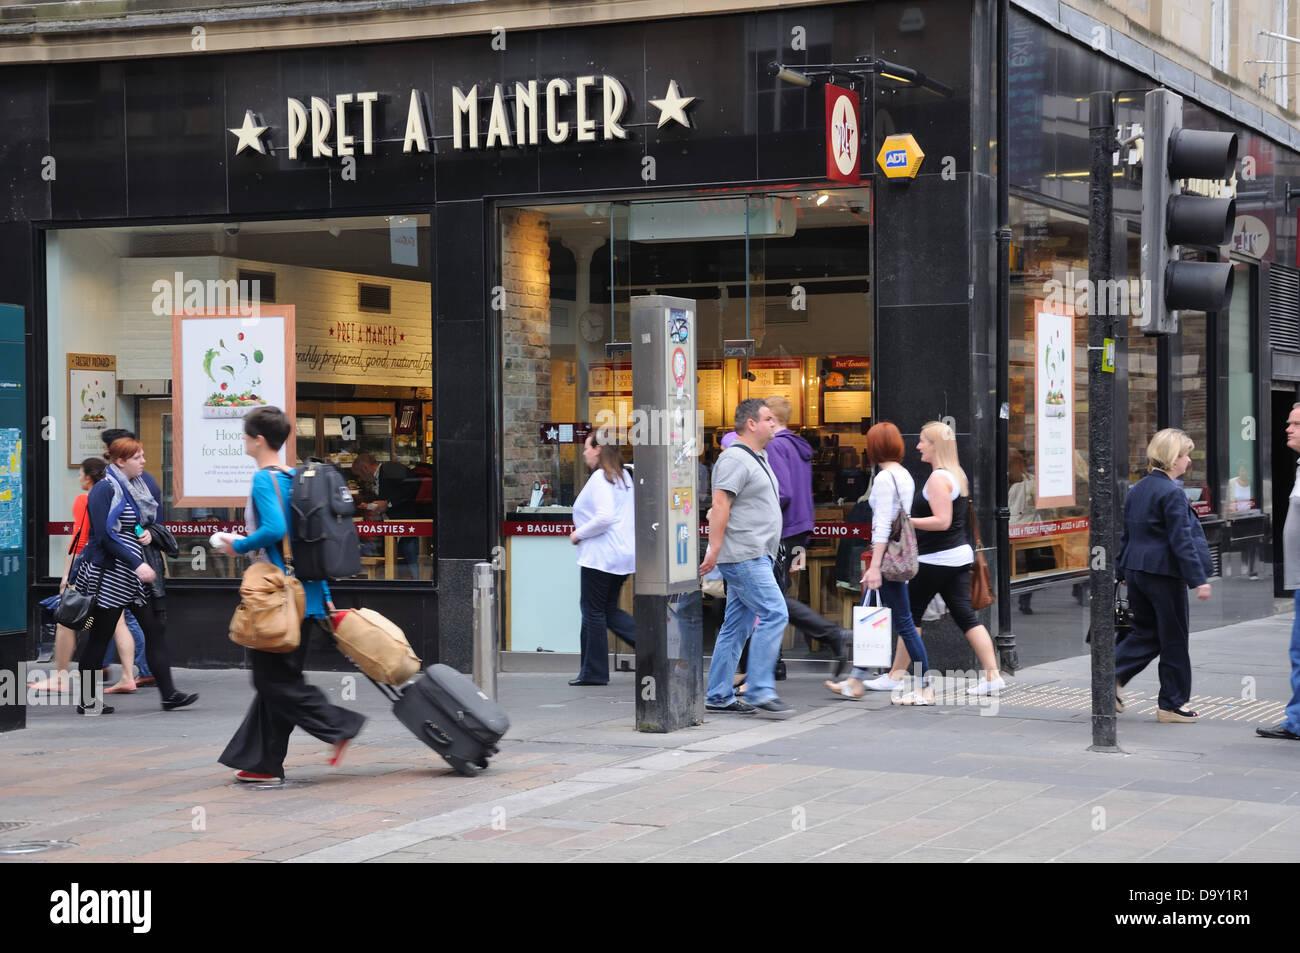 Pret a manger food shop in Gordon Street, Glasgow, Scotland, UK - Stock Image